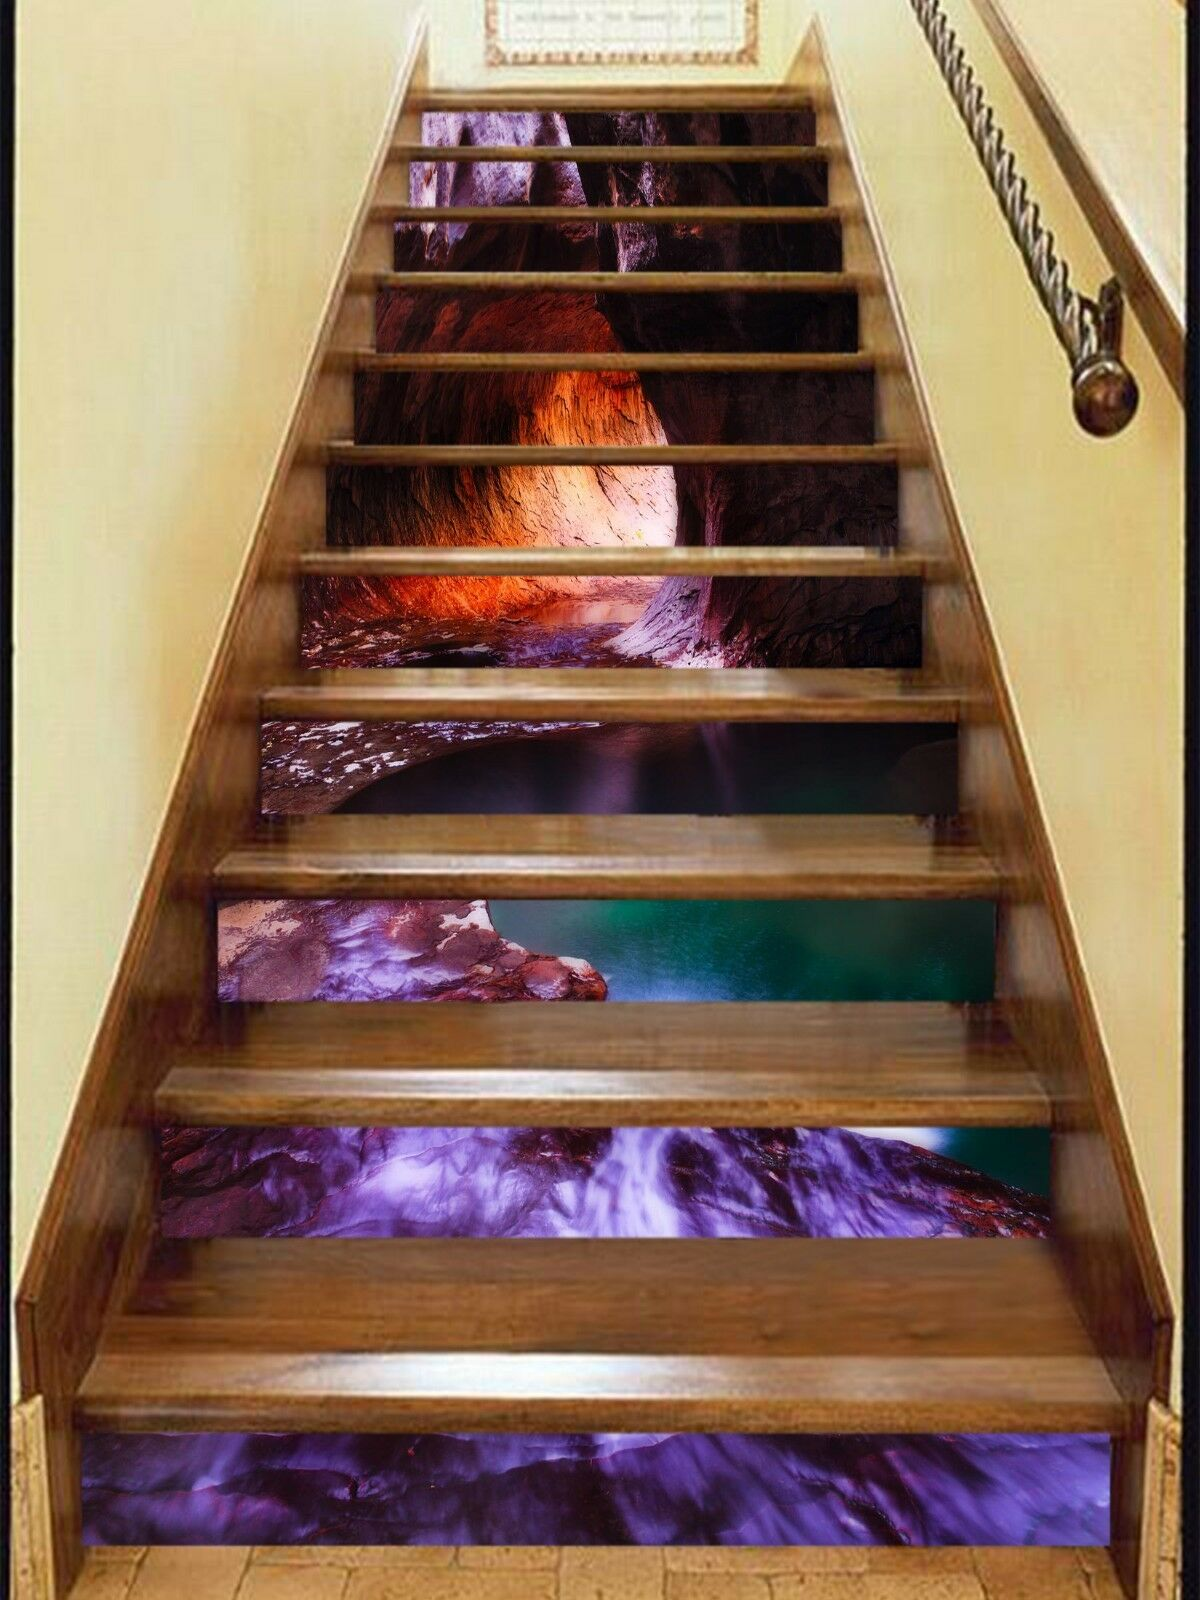 3D Höhlensee 283 Stair Risers Dekoration Fototapete Vinyl Aufkleber Tapete DE